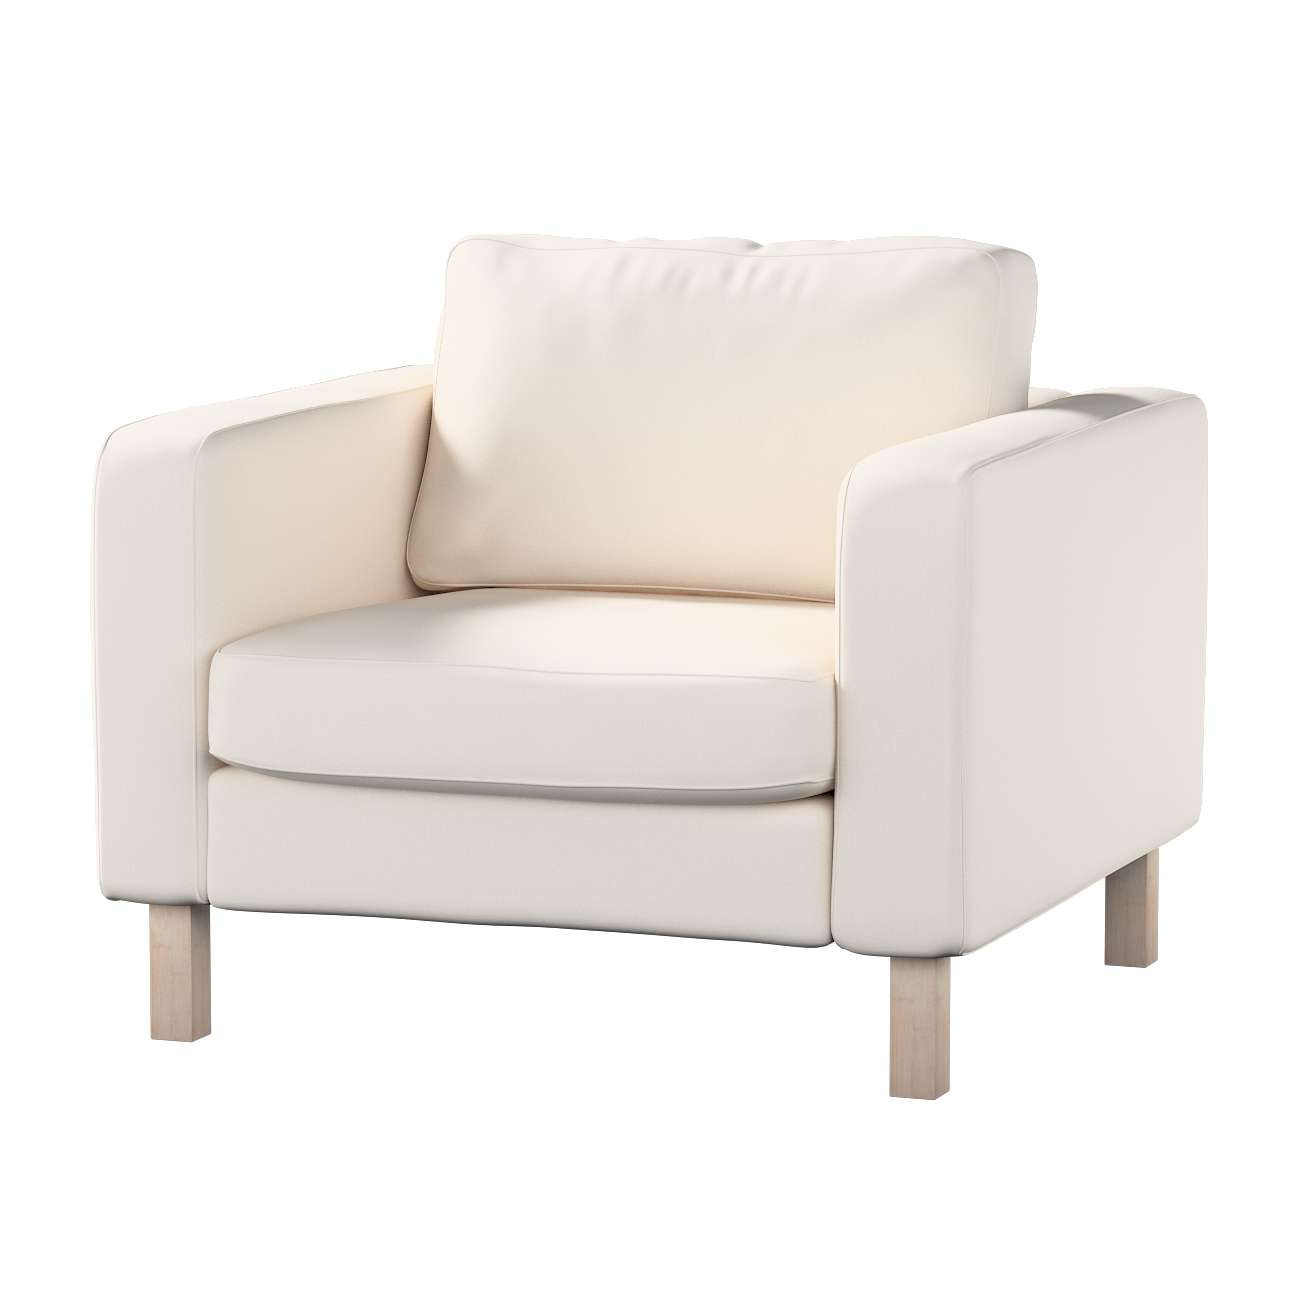 karlstad dekoria. Black Bedroom Furniture Sets. Home Design Ideas